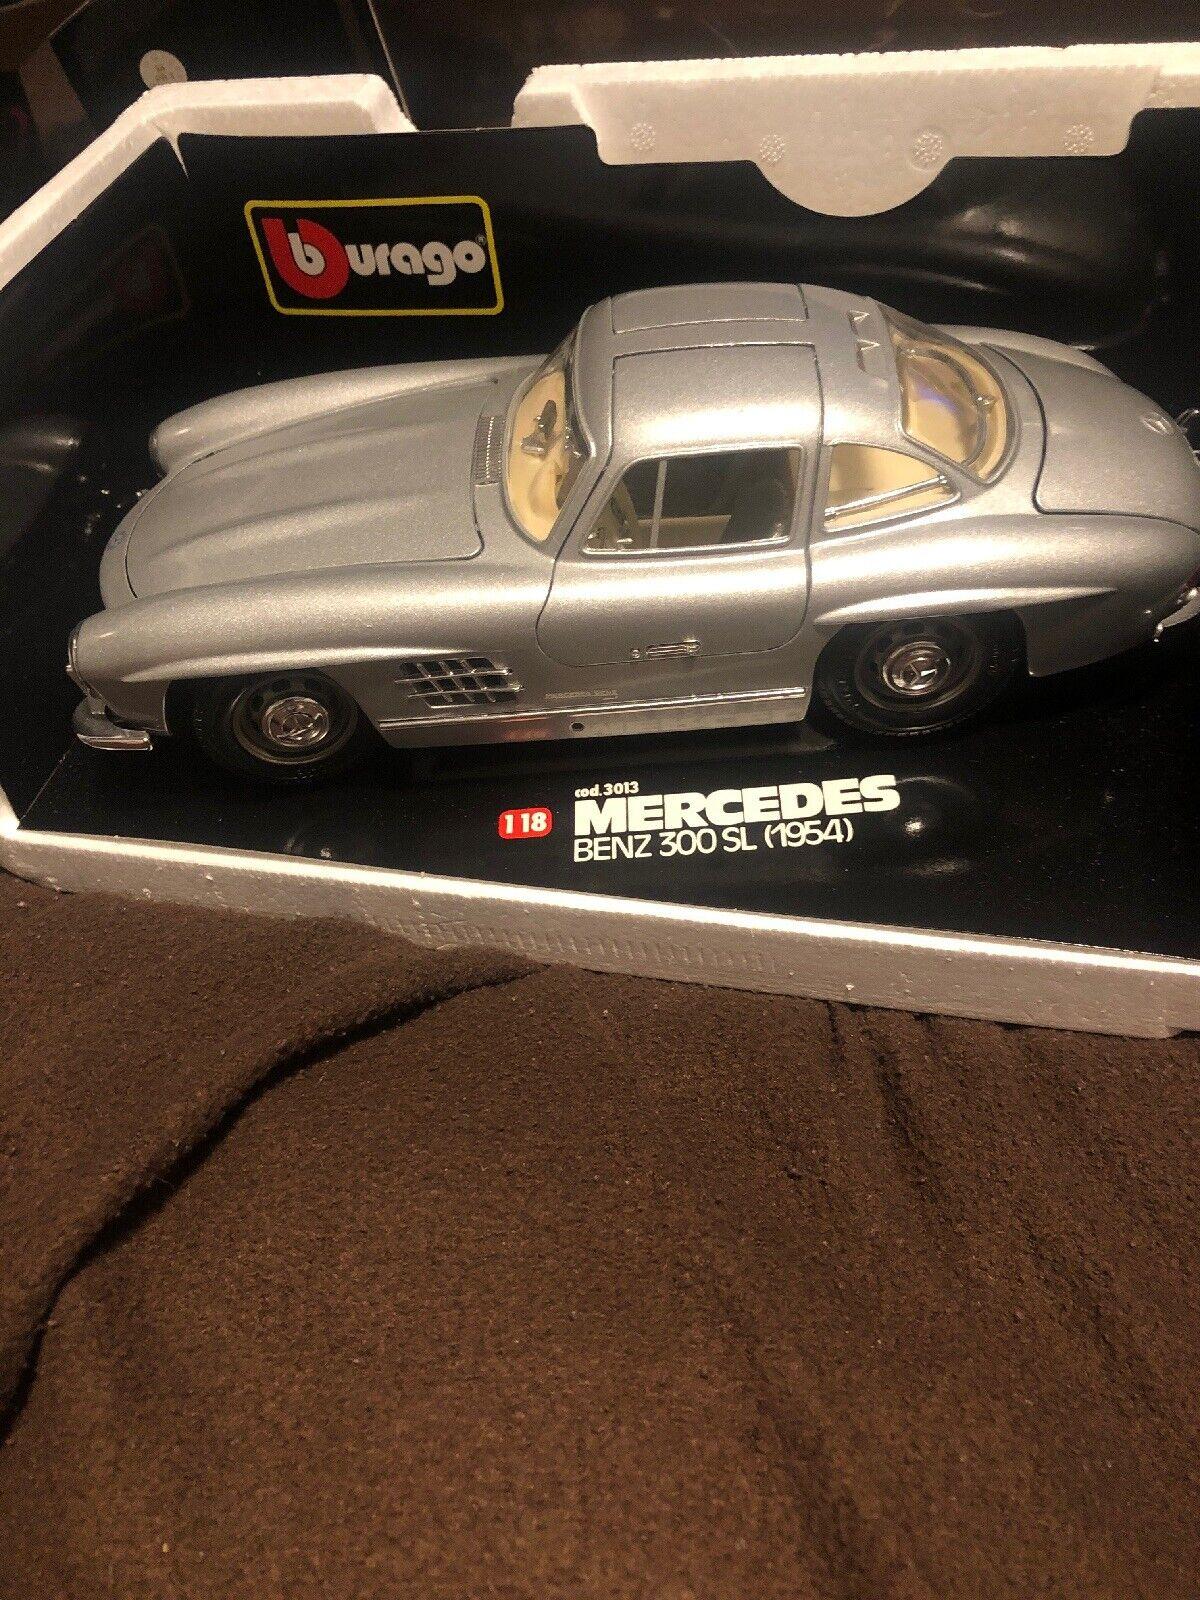 Burago 1954 Mercedes Benz 300 SL Gull Wing 1 18 Scale Die Cast Metal Model